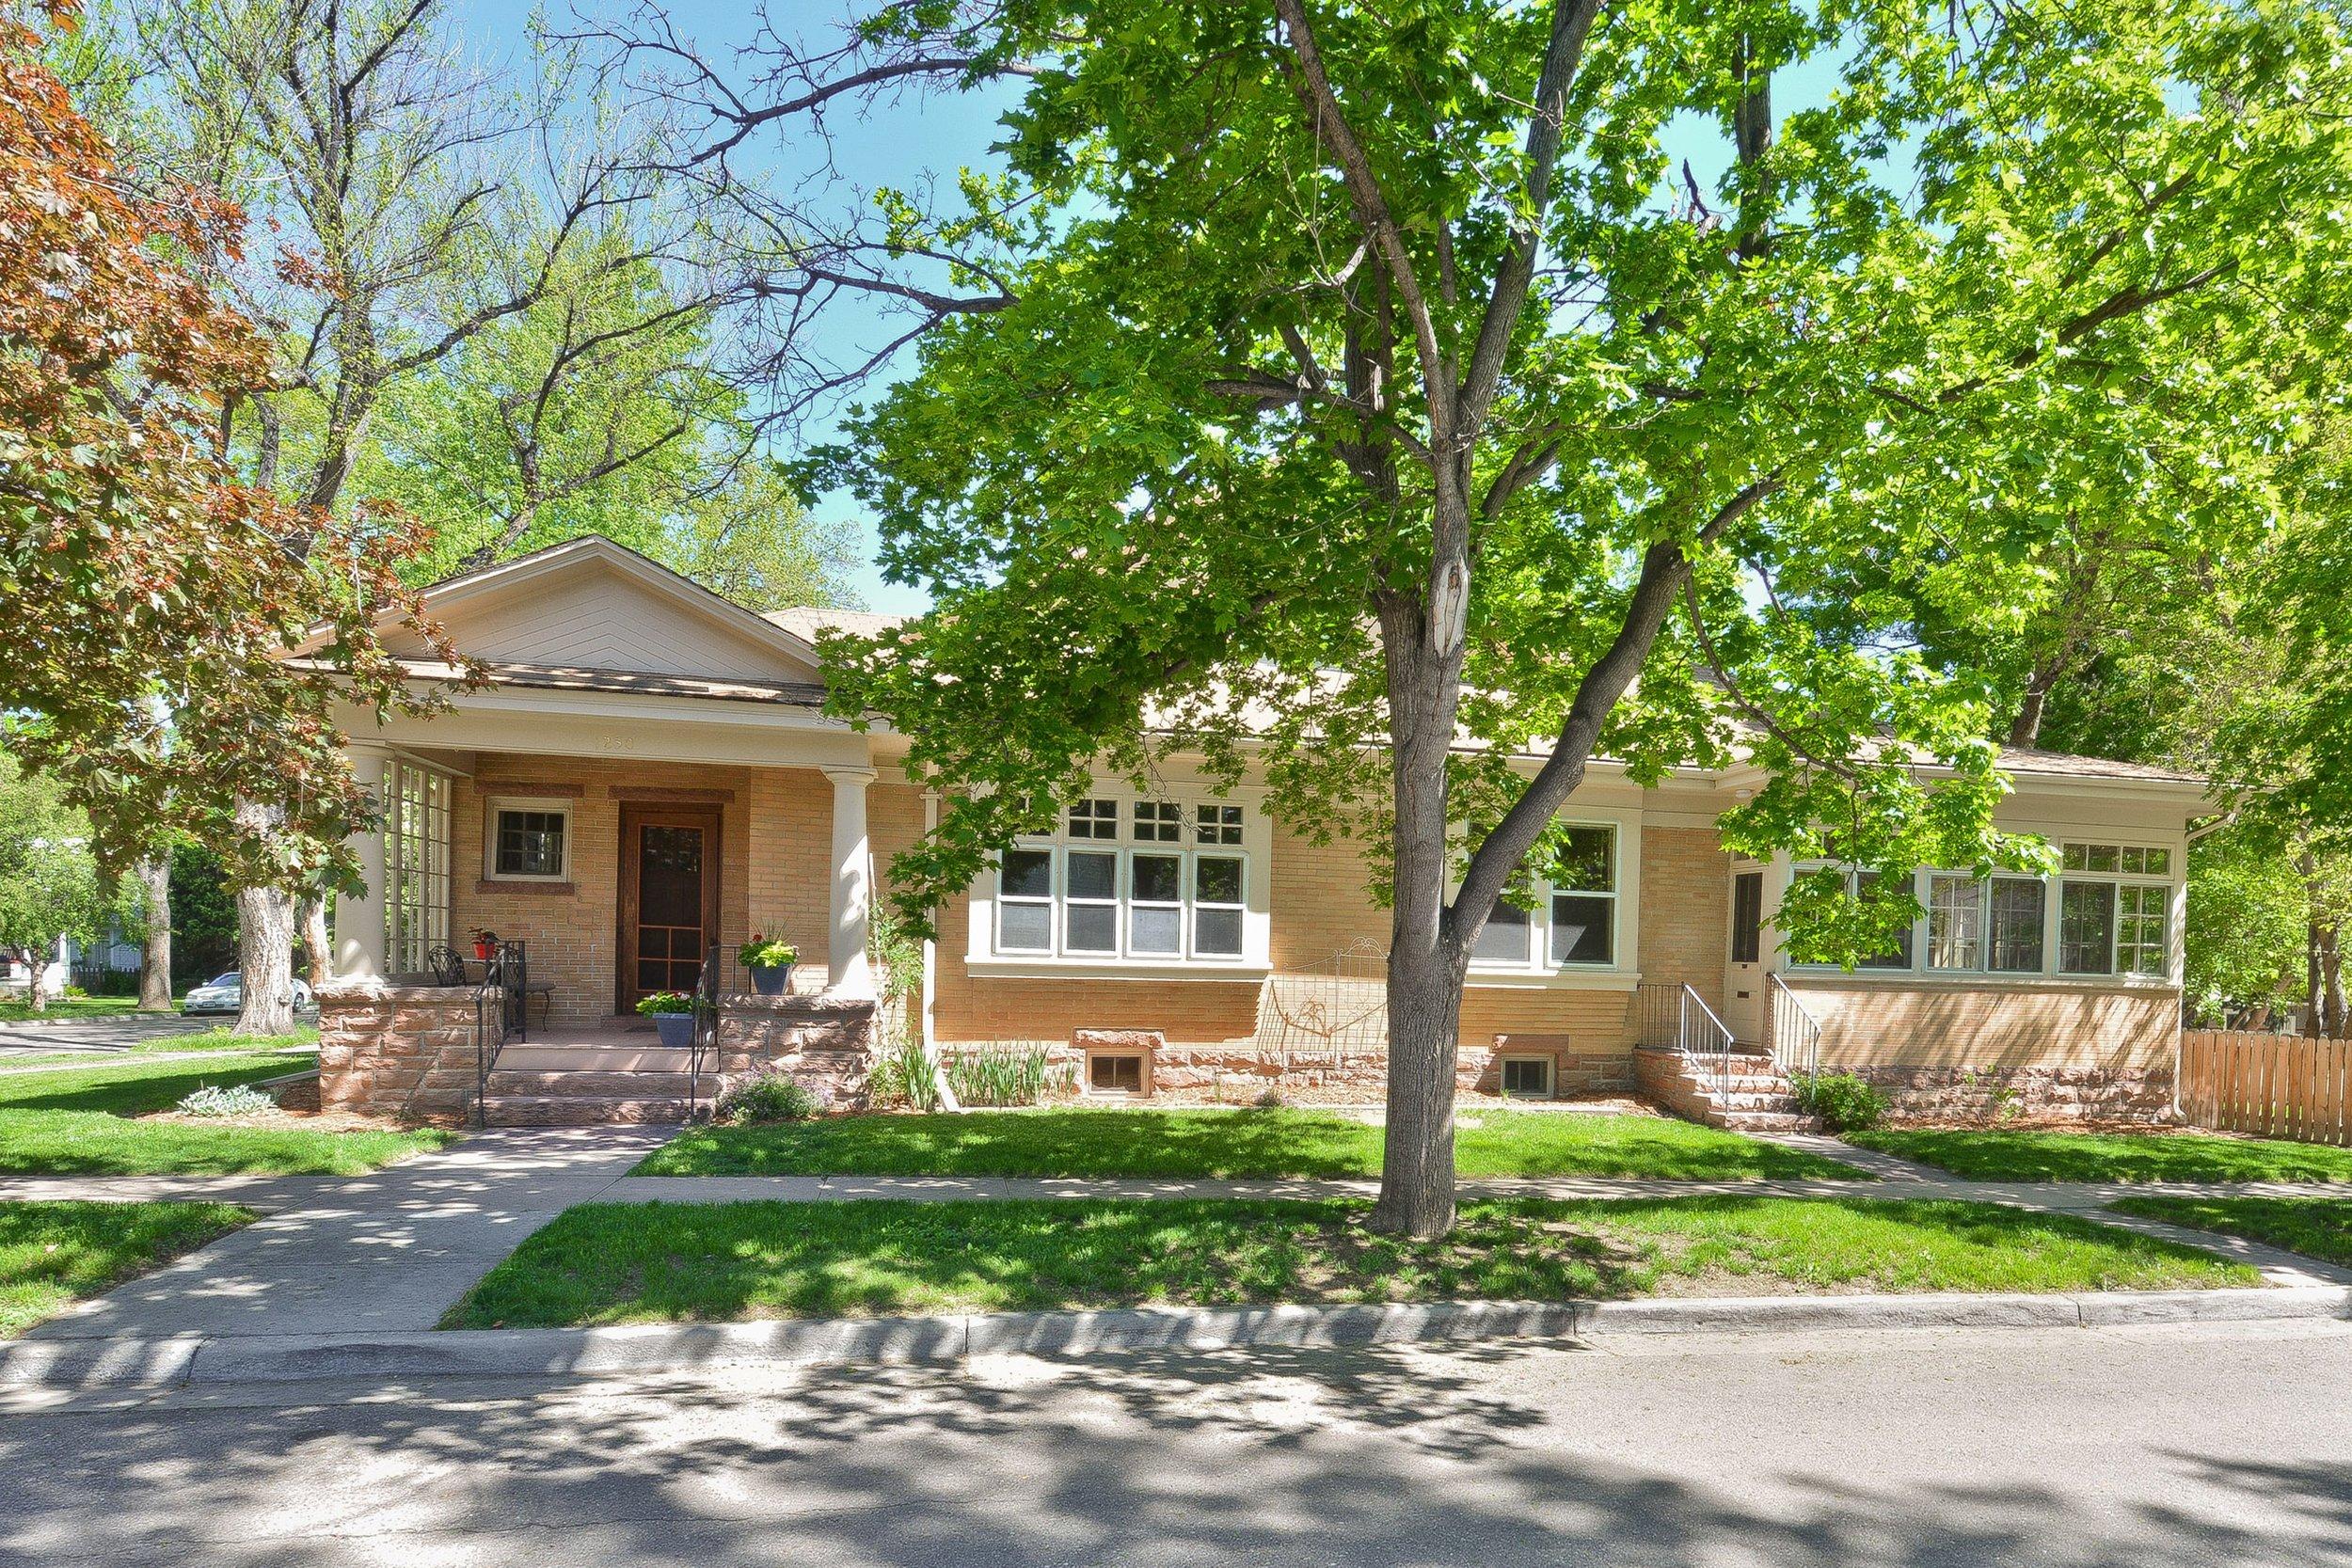 1250 Carlton Pl, Longmont $625,000